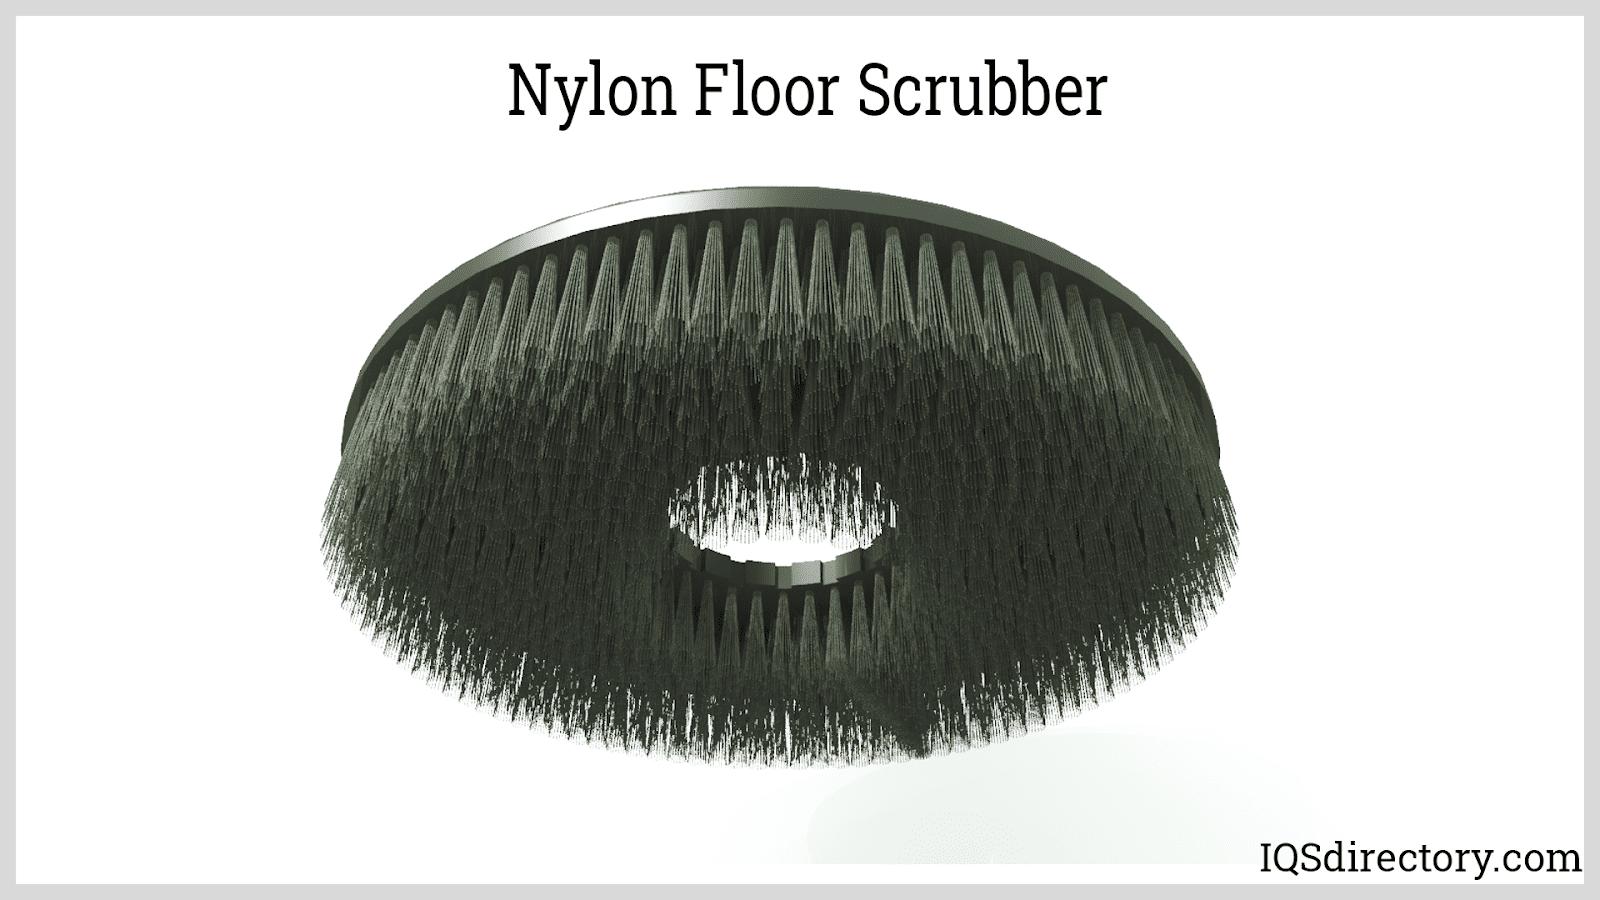 Nylon Floor Scrubber